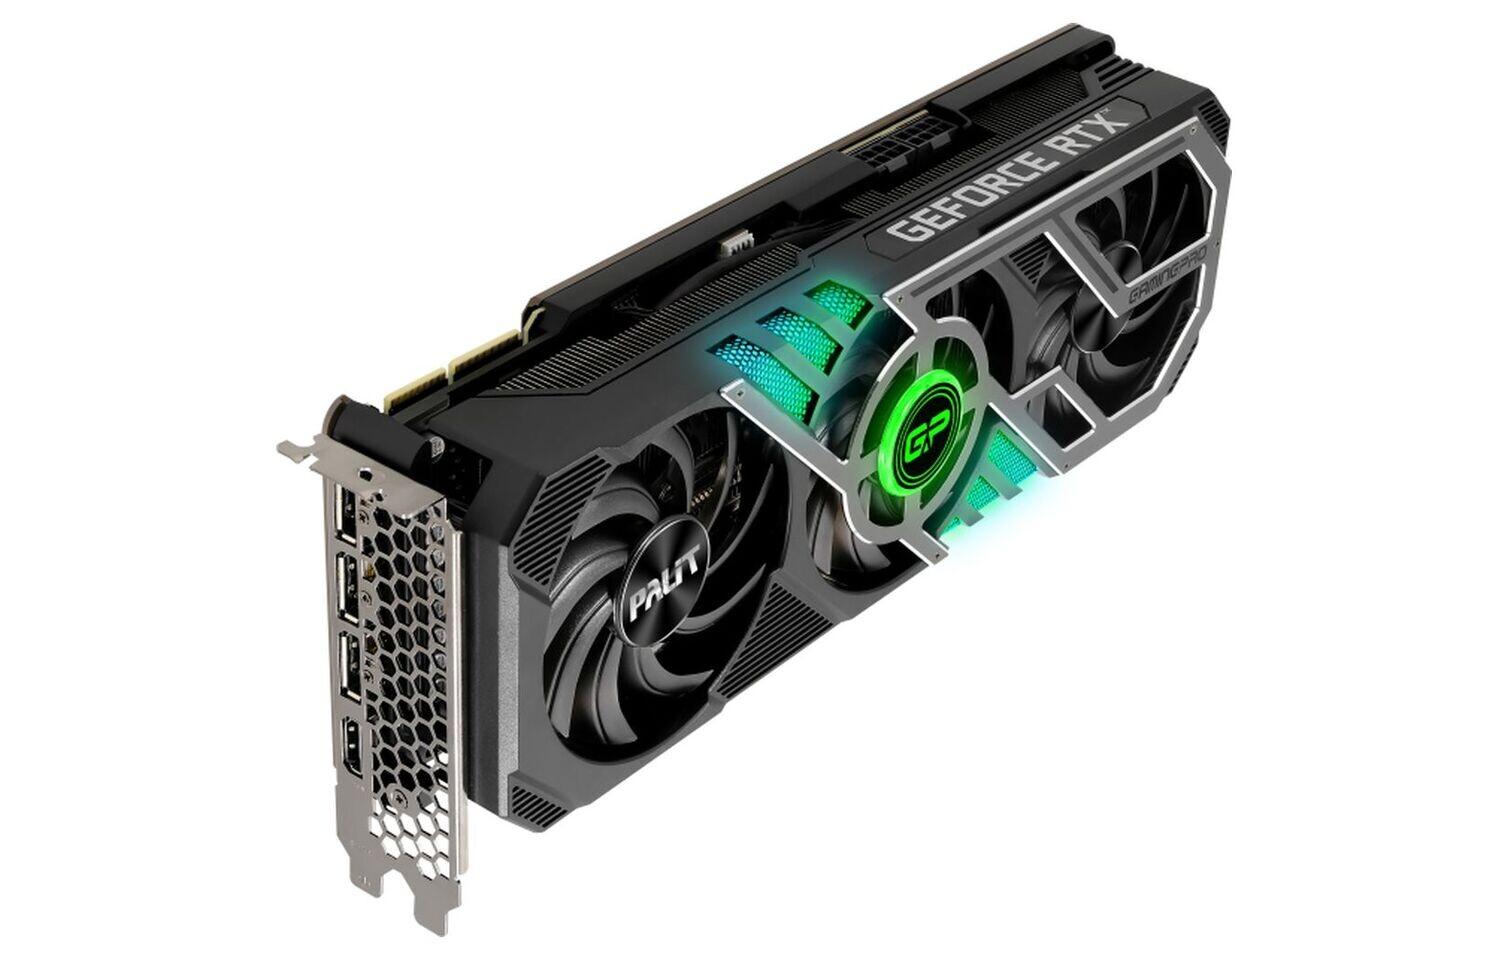 VGA Palit GeForce RTX3070 8GB GDDR6 کارت گرافیک پالیت جی فورس ایکس آر تی ایکس ۳۰۷۰